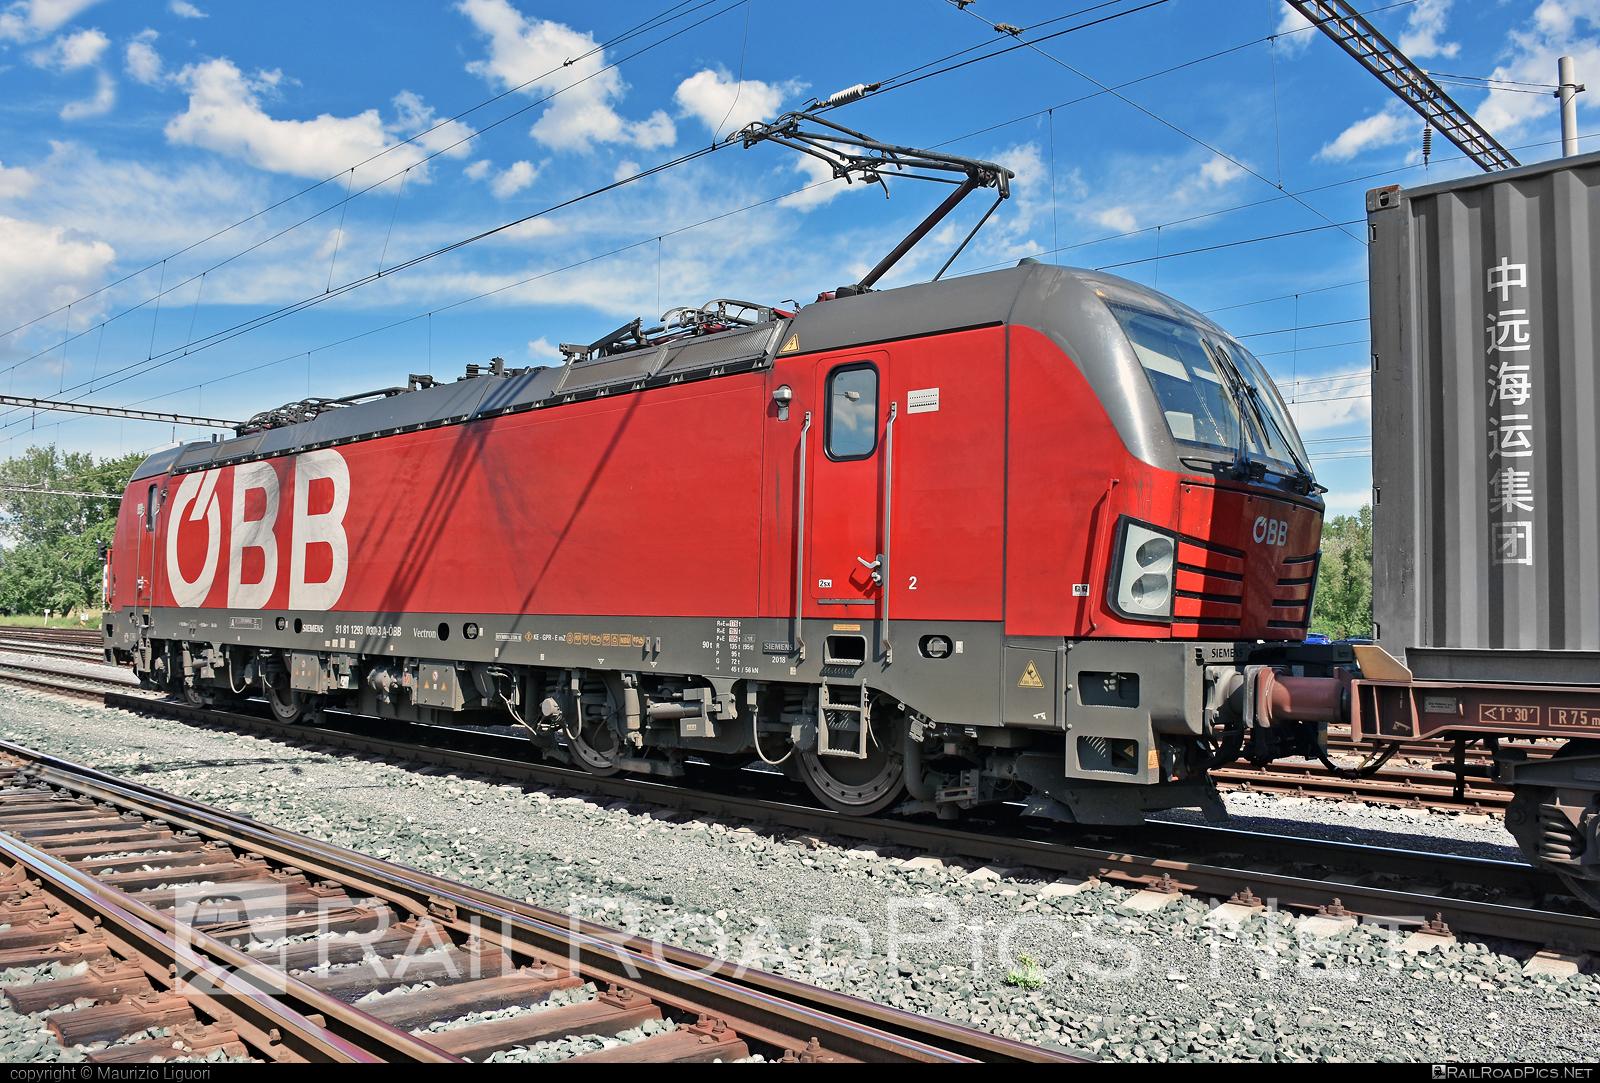 Siemens Vectron MS - 1293 030 operated by Rail Cargo Carrier – Italy s.r.l #obb #osterreichischebundesbahnen #rccit #siemens #siemensvectron #siemensvectronms #vectron #vectronms